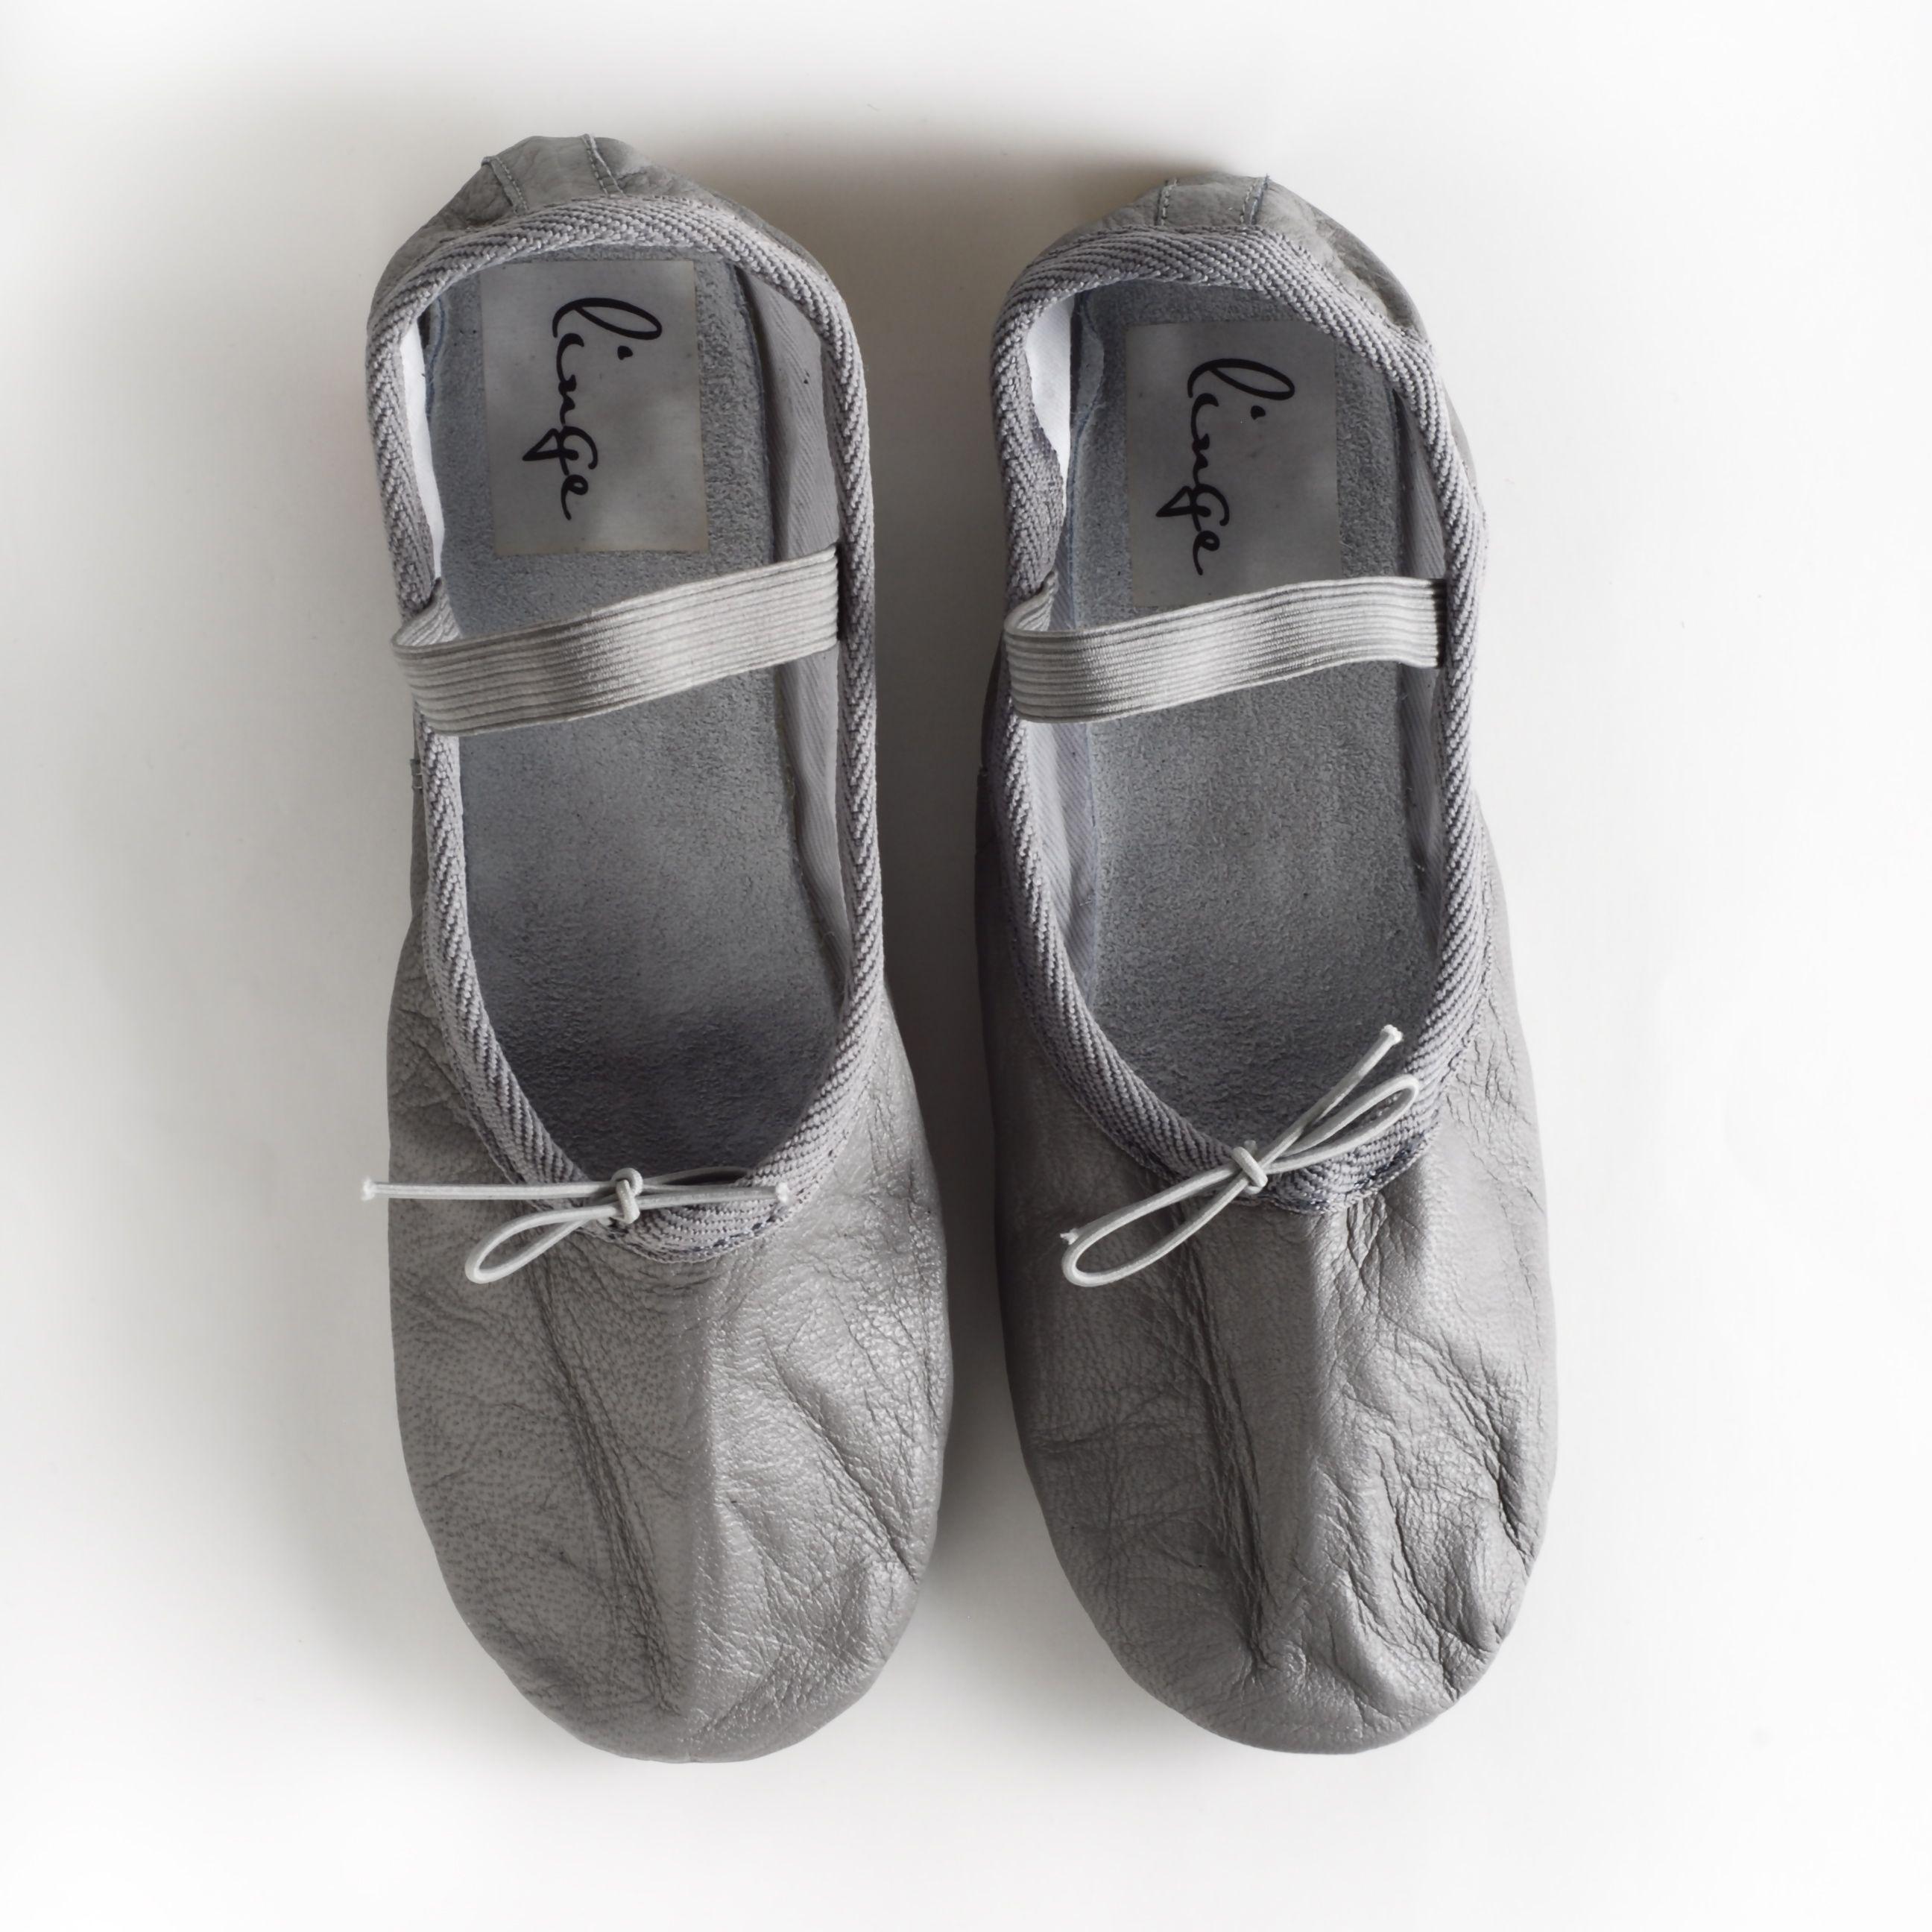 Www Lingeshoes Com Charcoal Ballet Shoes Grey Ballet Slippers Charcoal Dance Shoes Ballet Shoes Dance Shoes Ballet Slippers